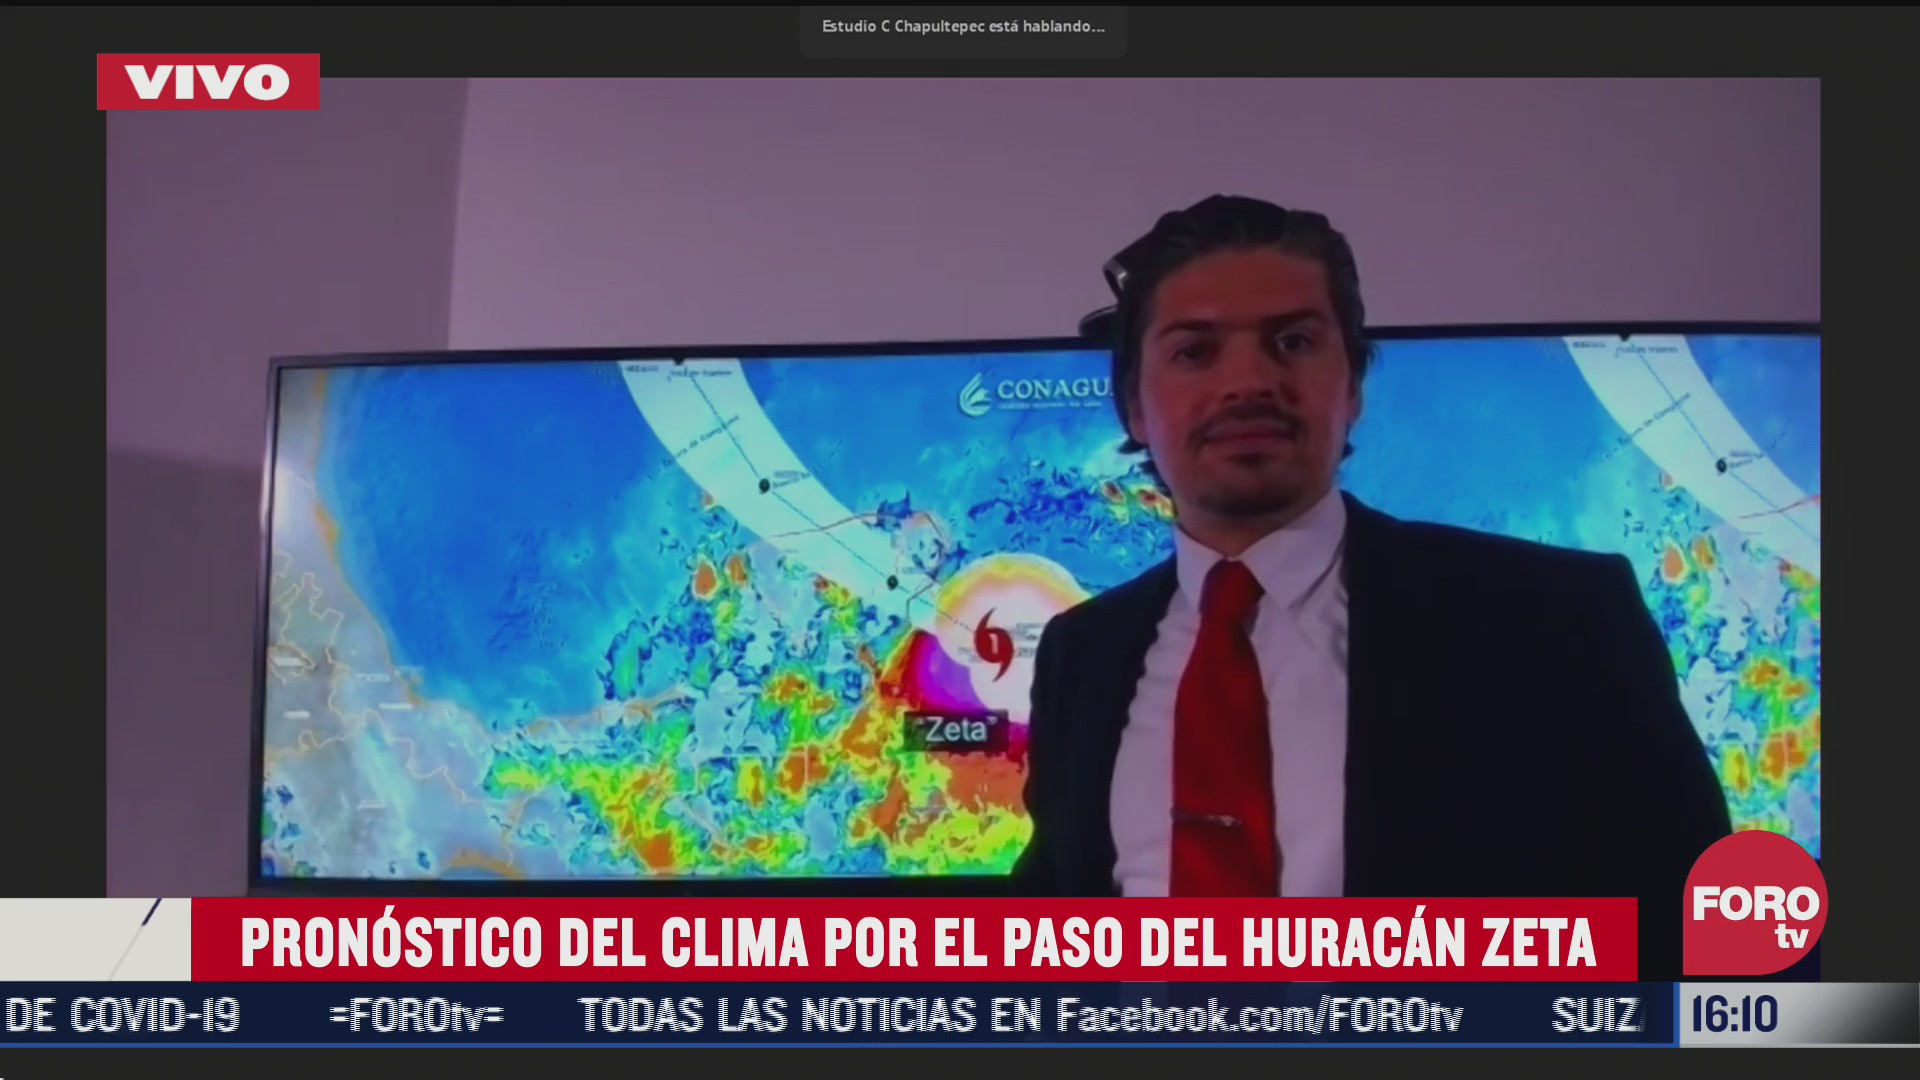 cual es la trayectoria prevista del huracan zeta